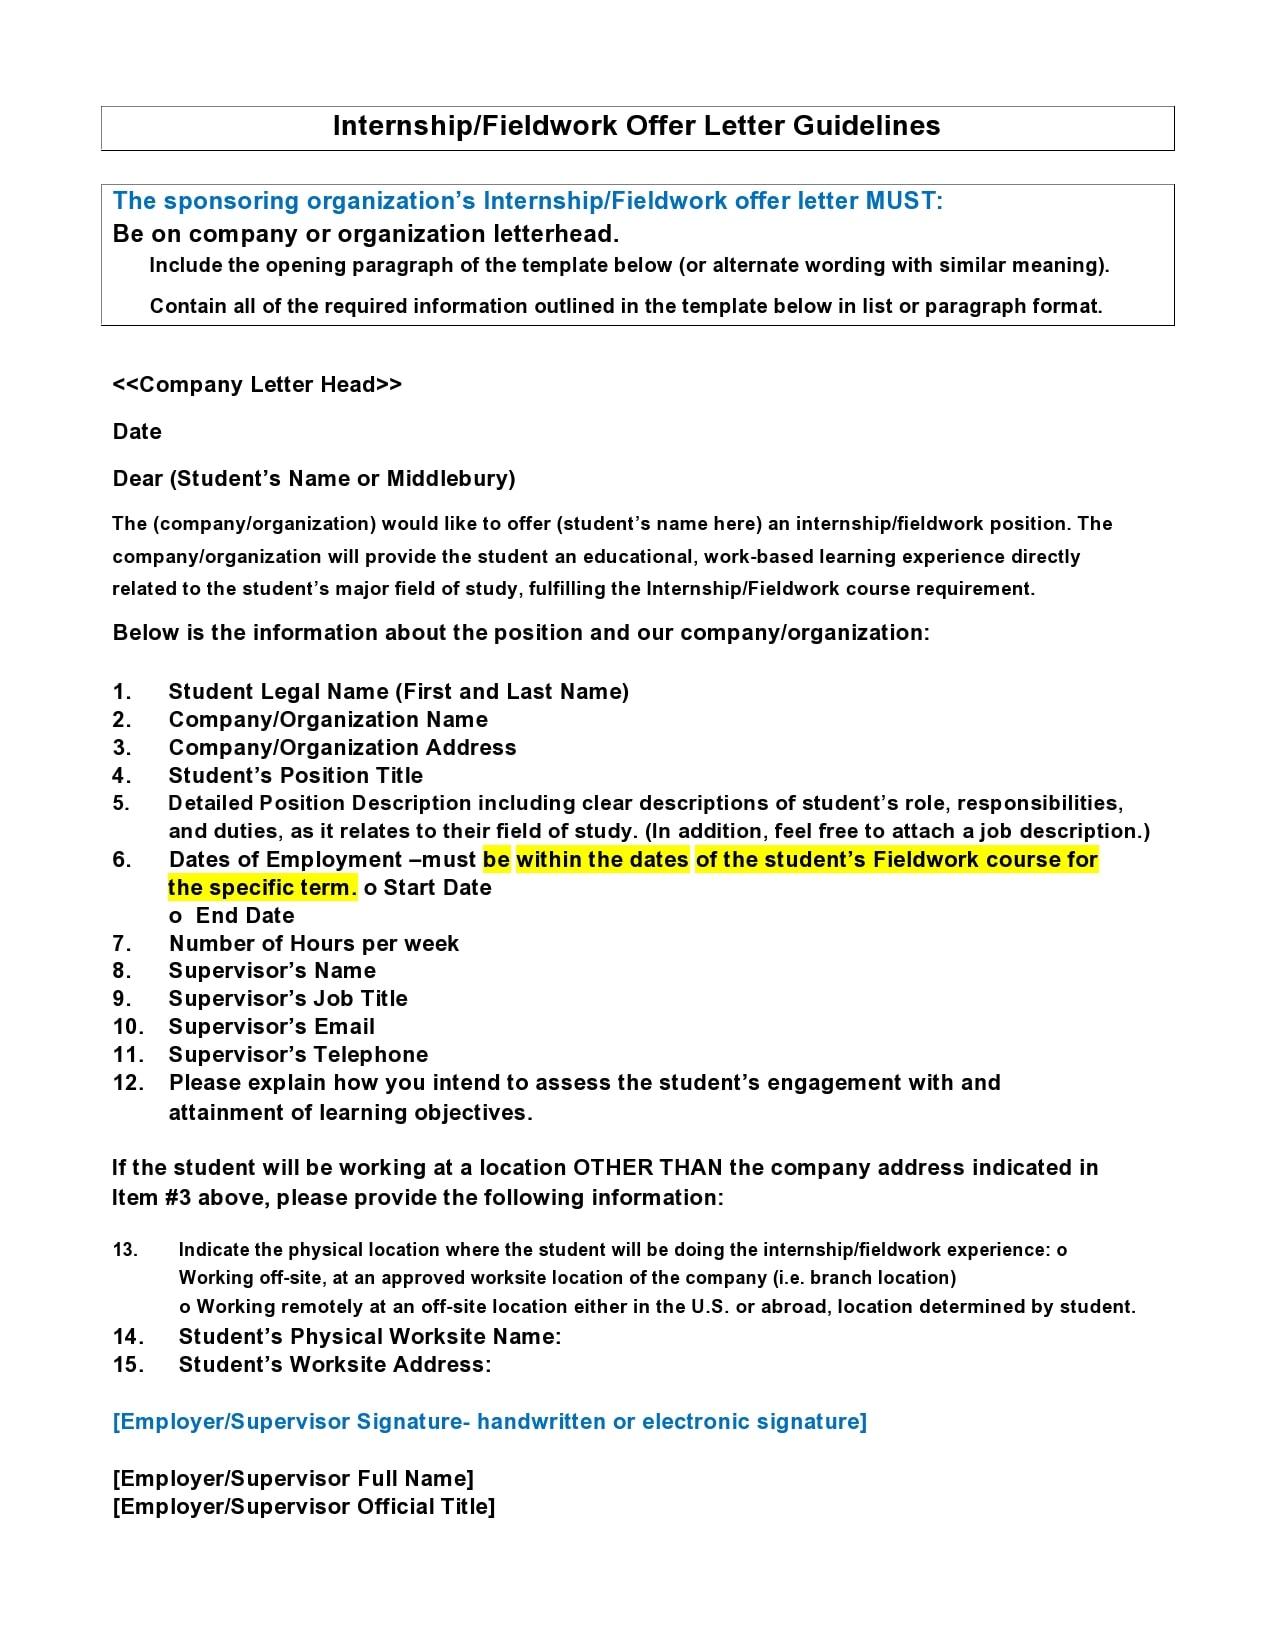 internship offer letter 12